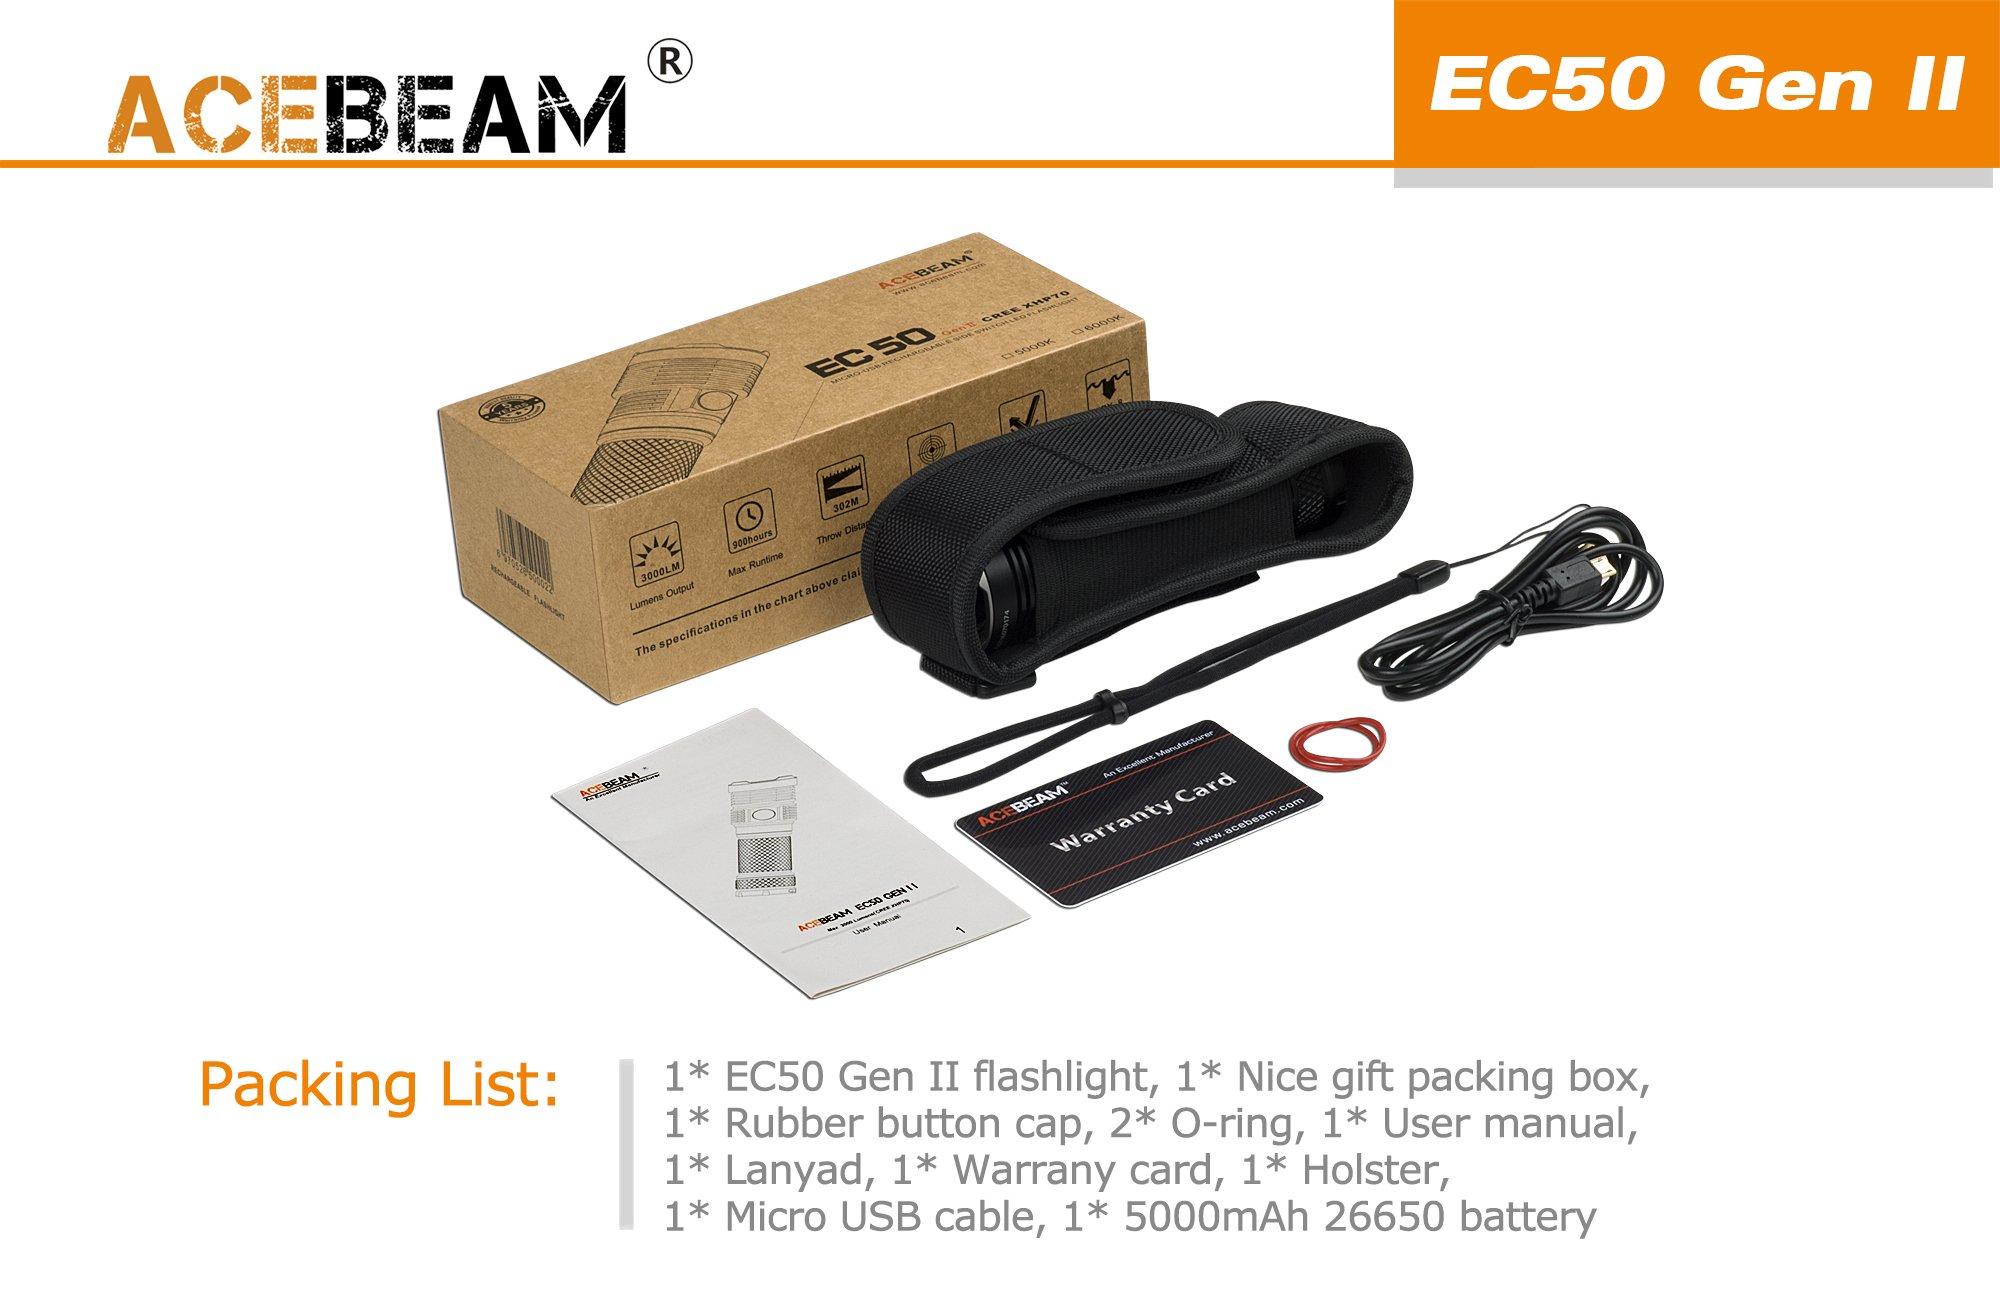 ACEBEAM EC50 GEN II LED Flashlight CREE XHP70 EDC LED Flashlight 5000K 3000lumens Rechargeable Flashlight with 5000mAh 26650 Battery